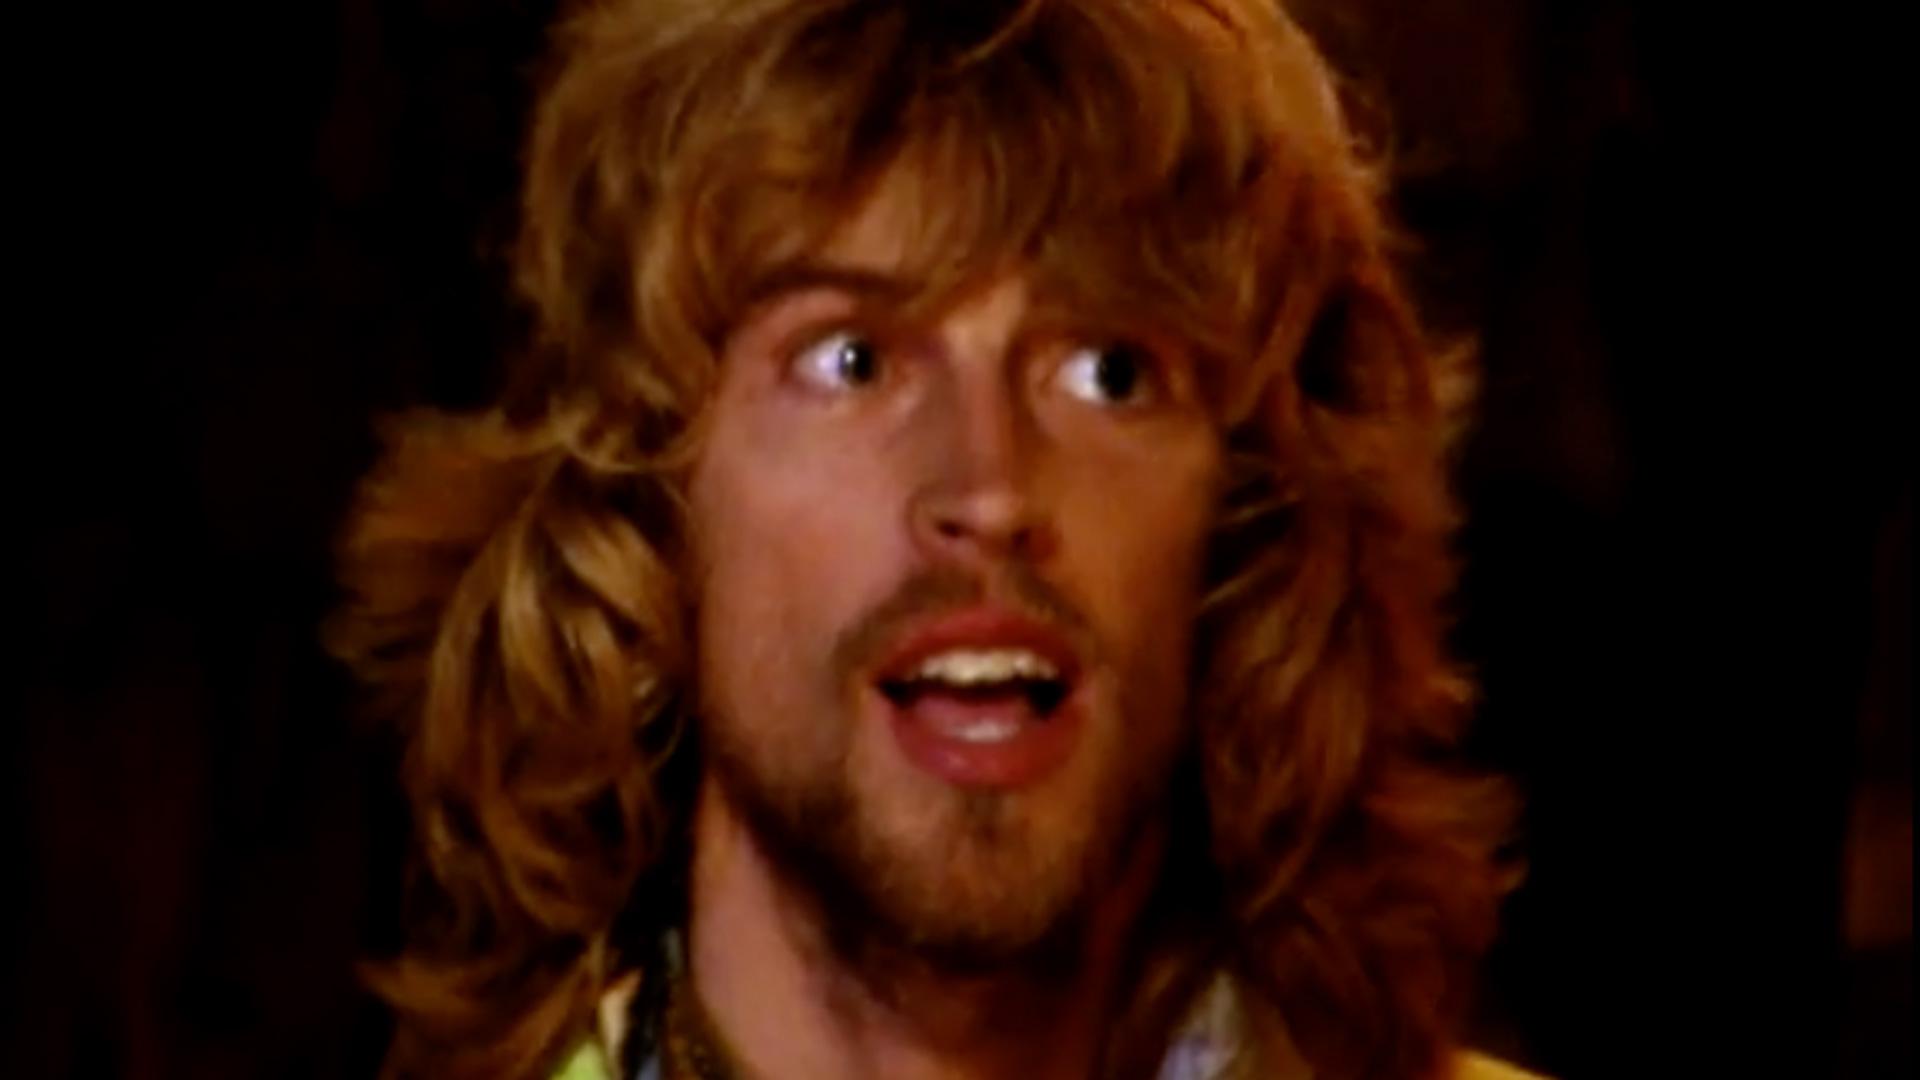 Erik Reichenbach from Survivor: Micronesia (Season 16)